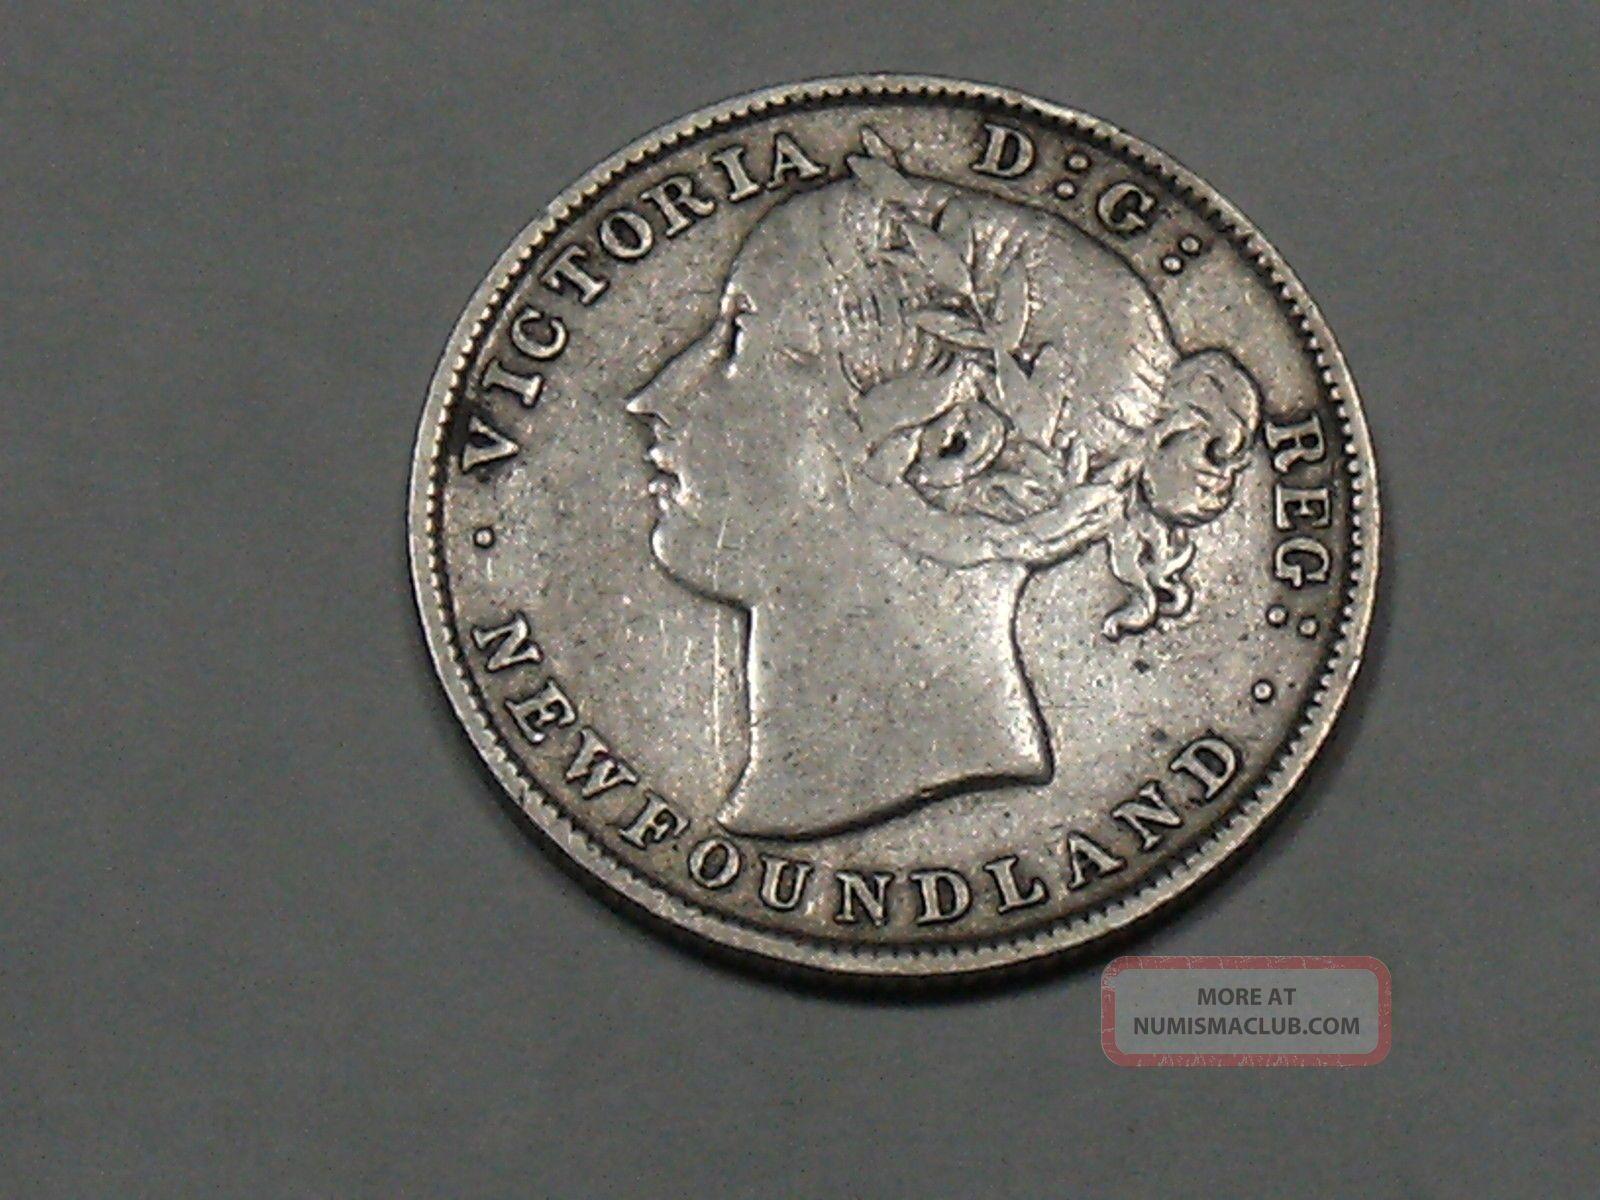 1896 Newfoundland Twenty Cent Silver Coin 6389b